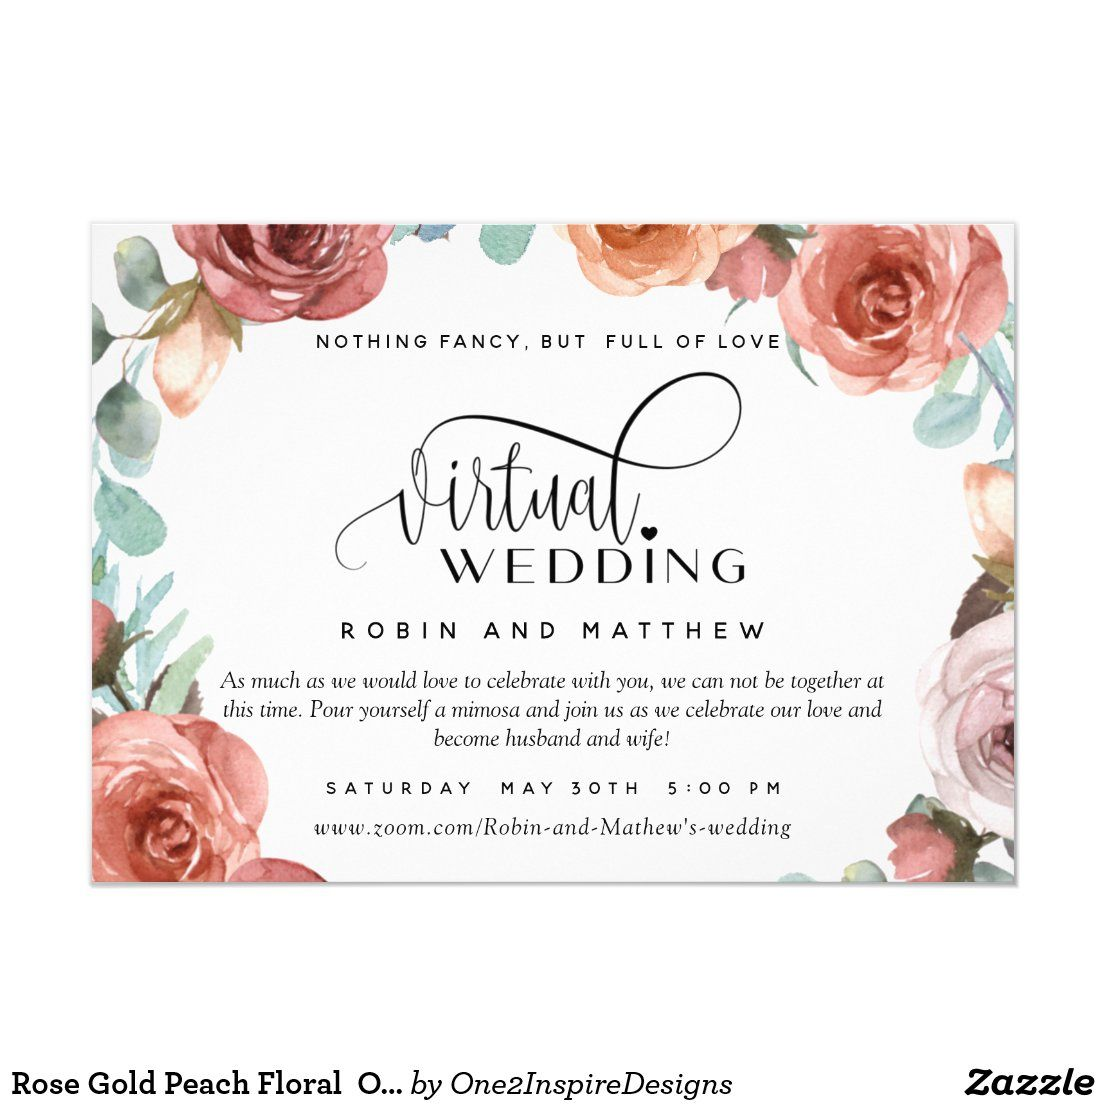 Rose Gold Peach Floral Online Virtual Wedding Invitation Zazzle Com In 2020 Wedding Invitations Floral Wedding Invitations Wedding Invitations Uk